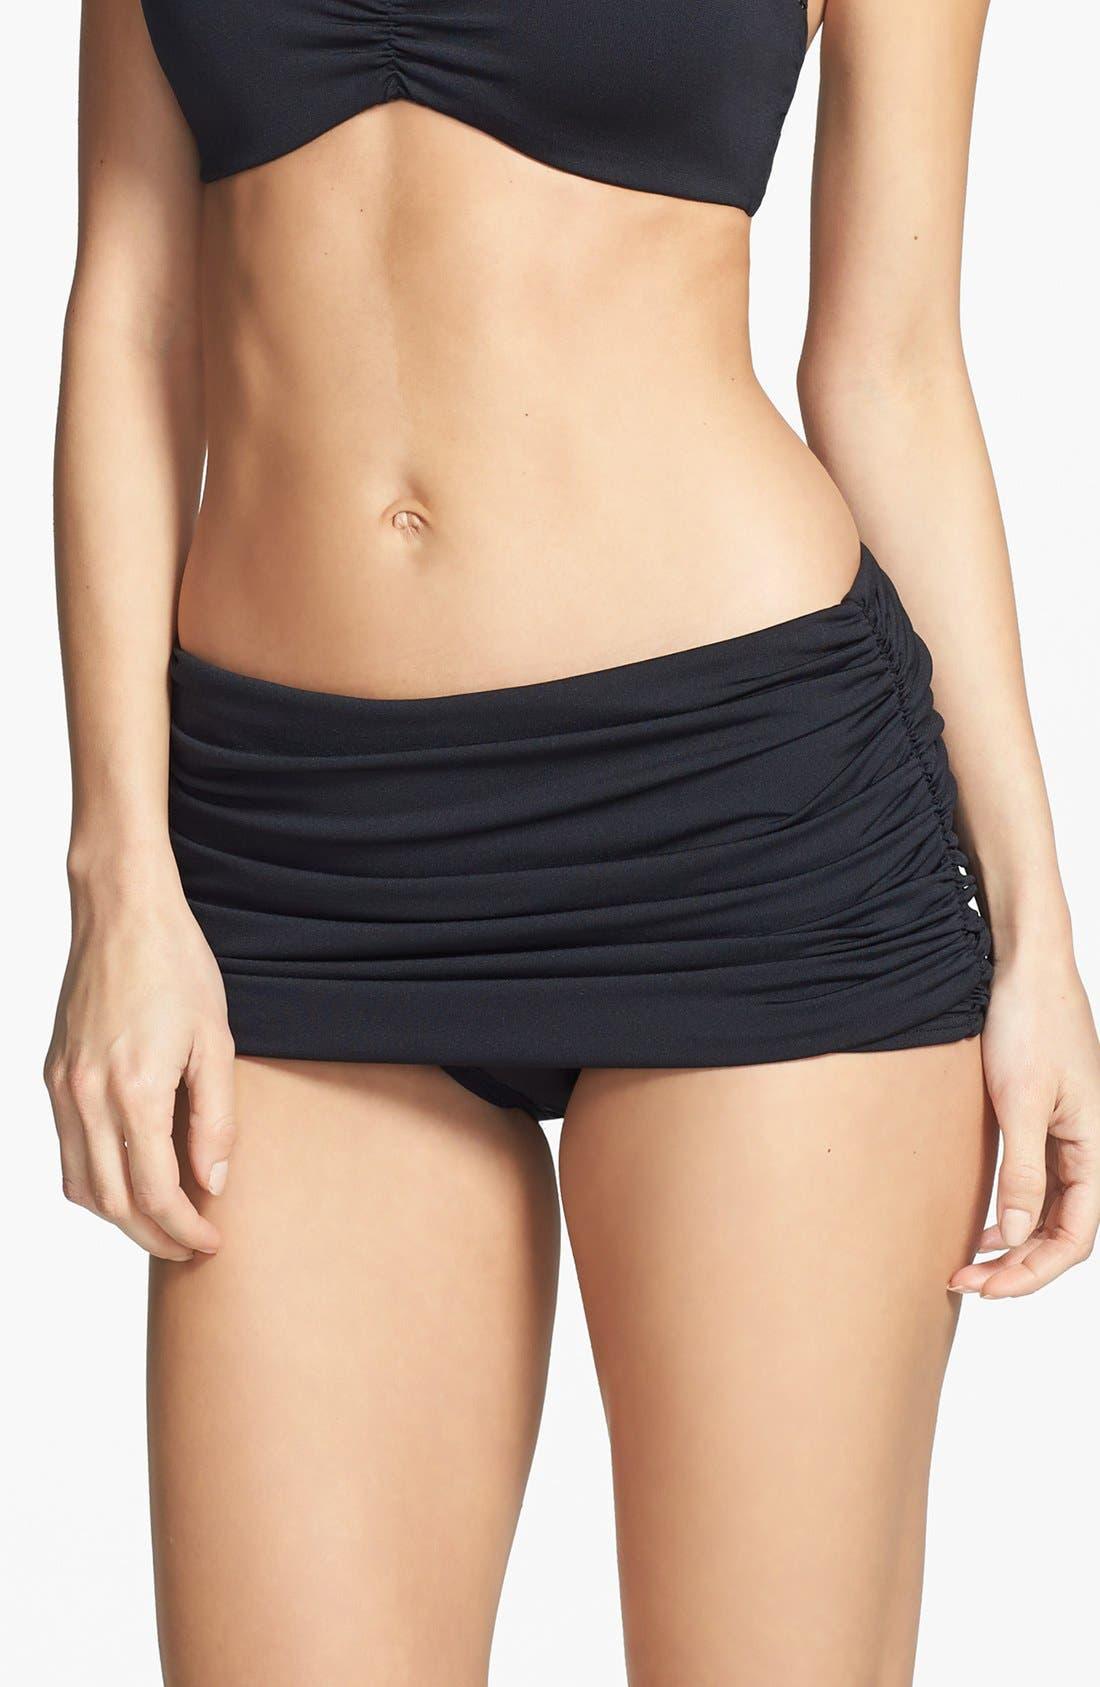 Carmen Marc Valvo 'Cape Town Beach' Shirred Skirted Bikini Bottoms,                             Main thumbnail 1, color,